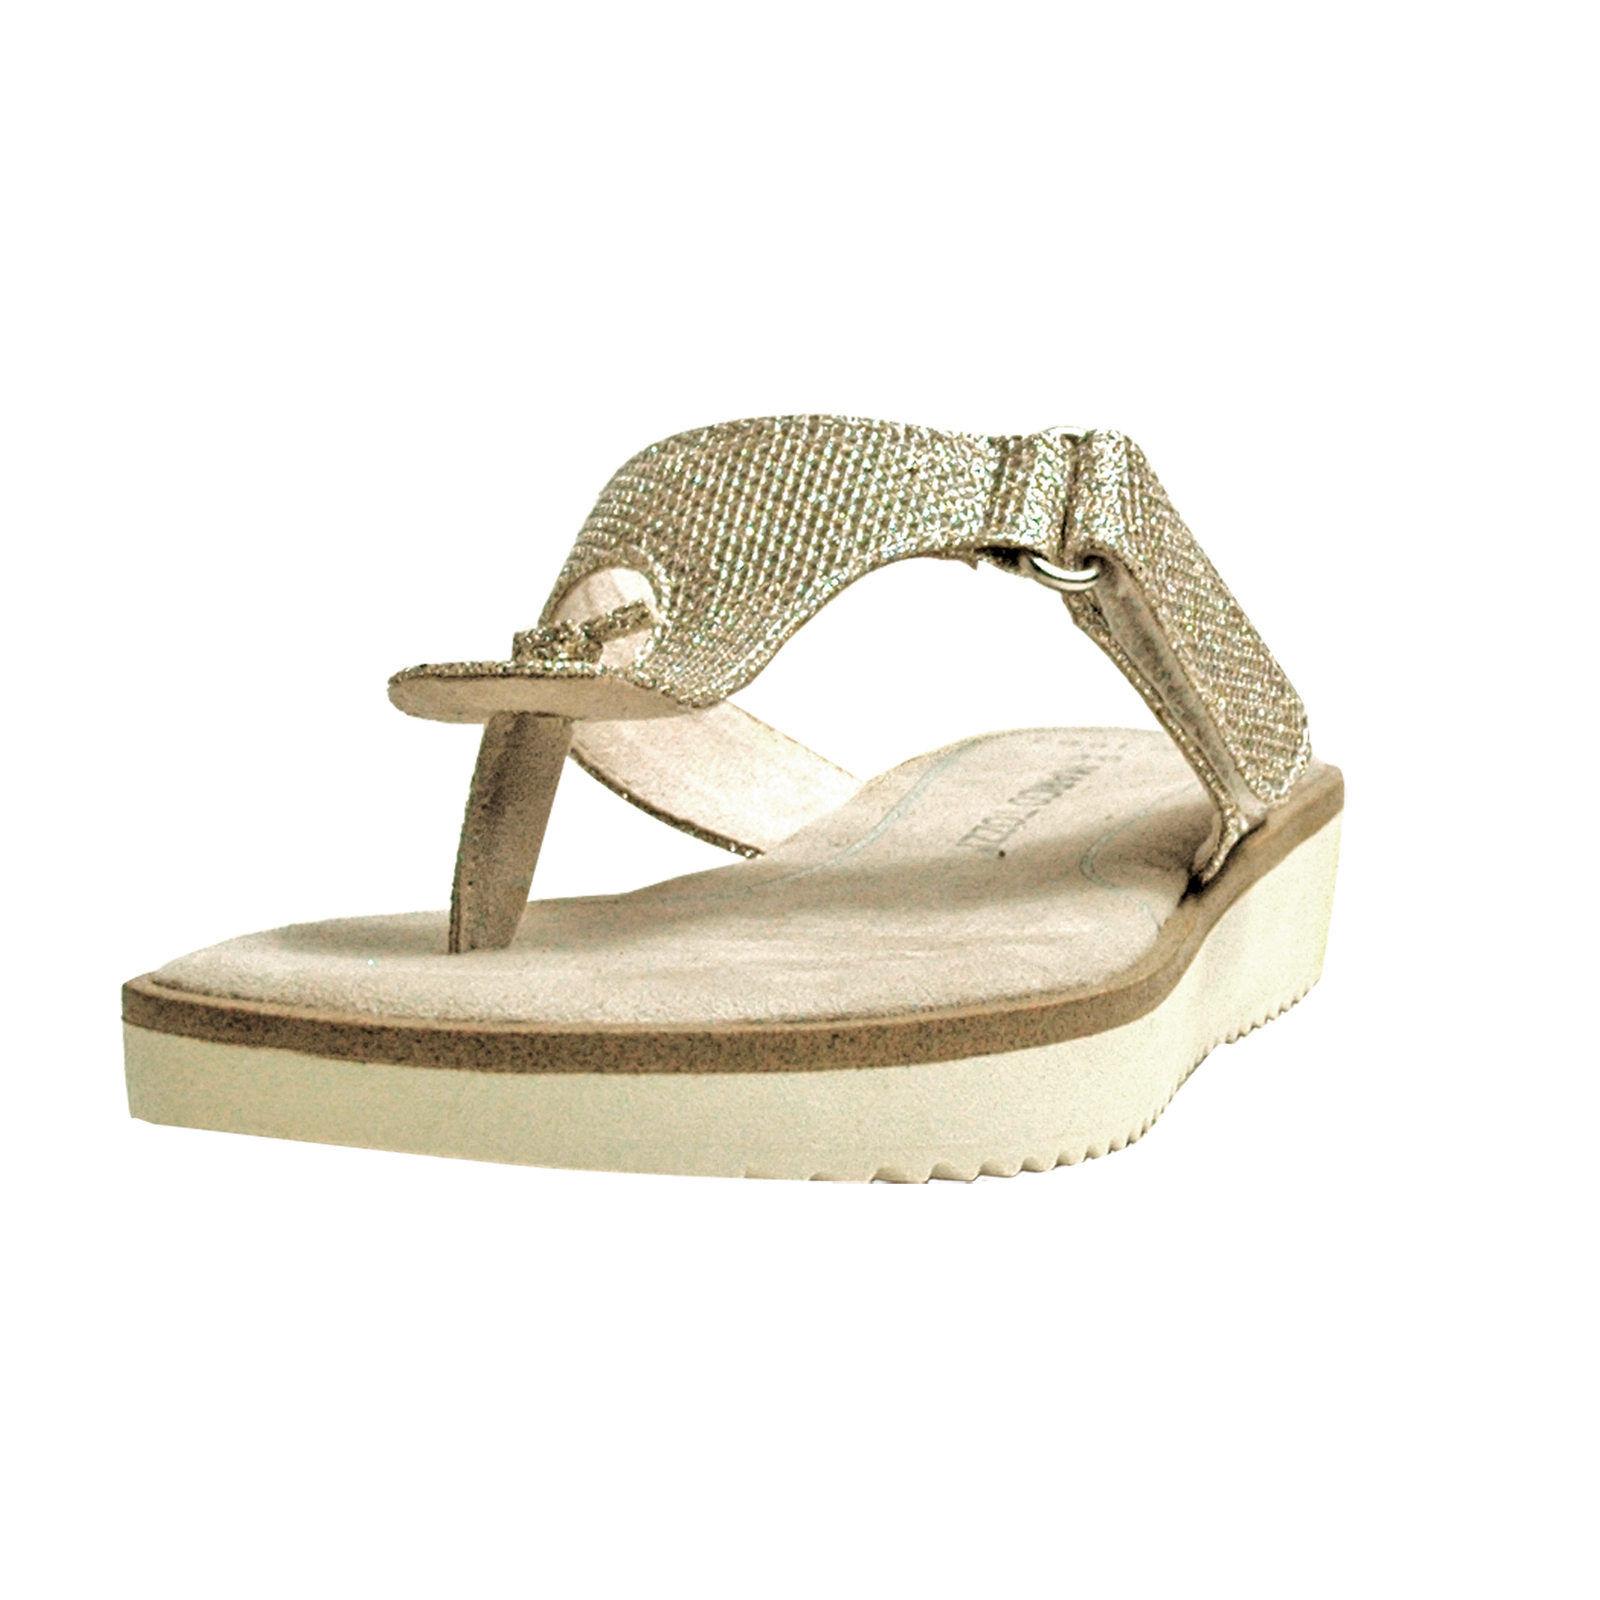 Marco tozzi sandals mujer 222710128989, platinum metal